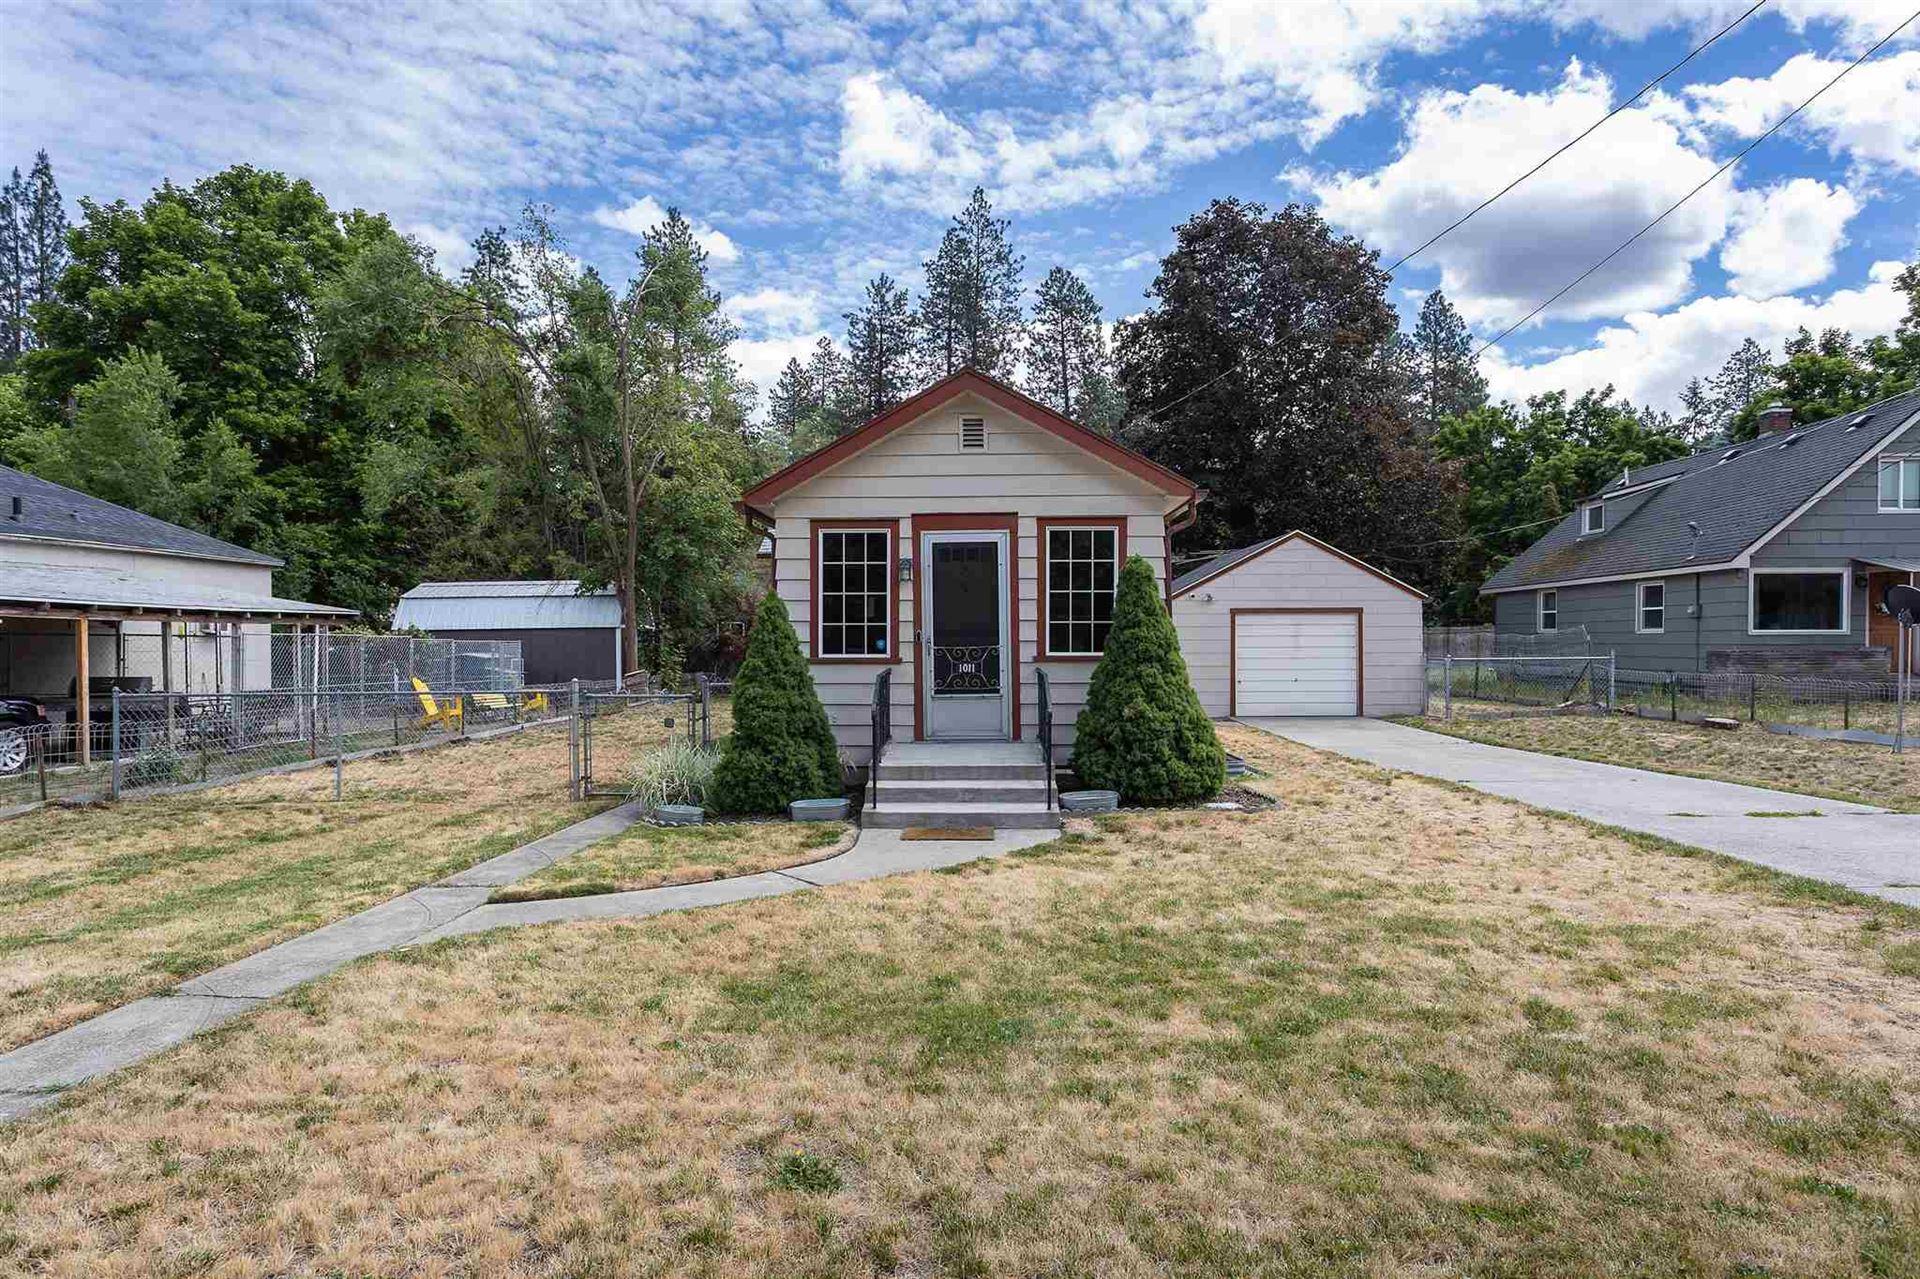 1011 S S. Freya St, Spokane, WA 99202 - #: 202116995